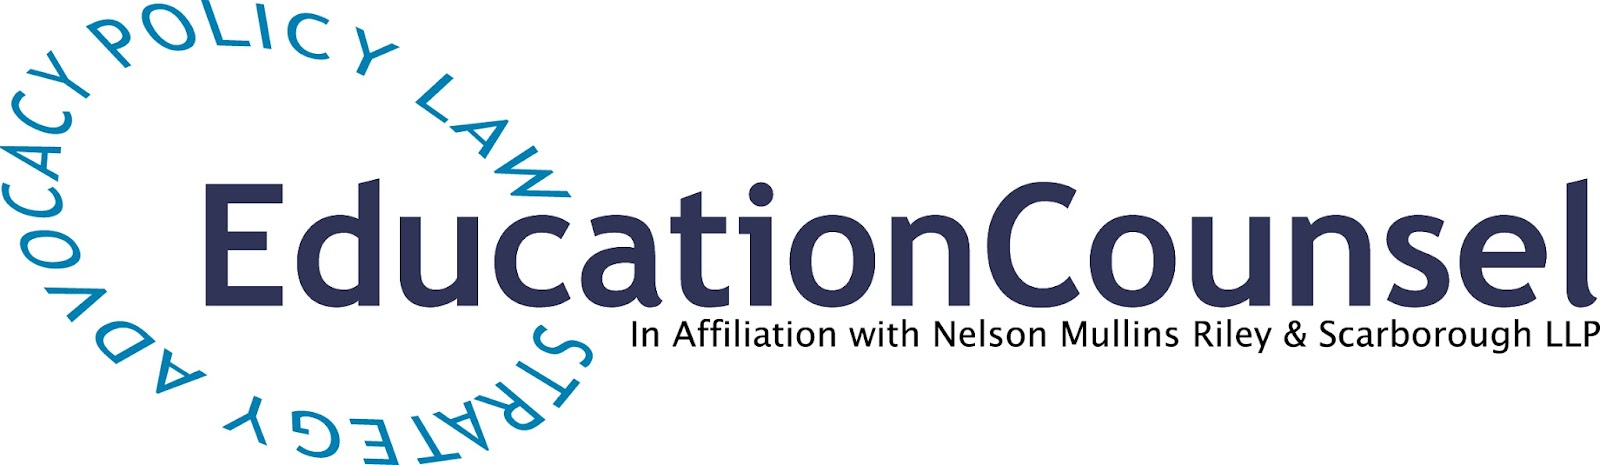 EducationCounsel_Logo_affiliation_HIGHRES.JPG